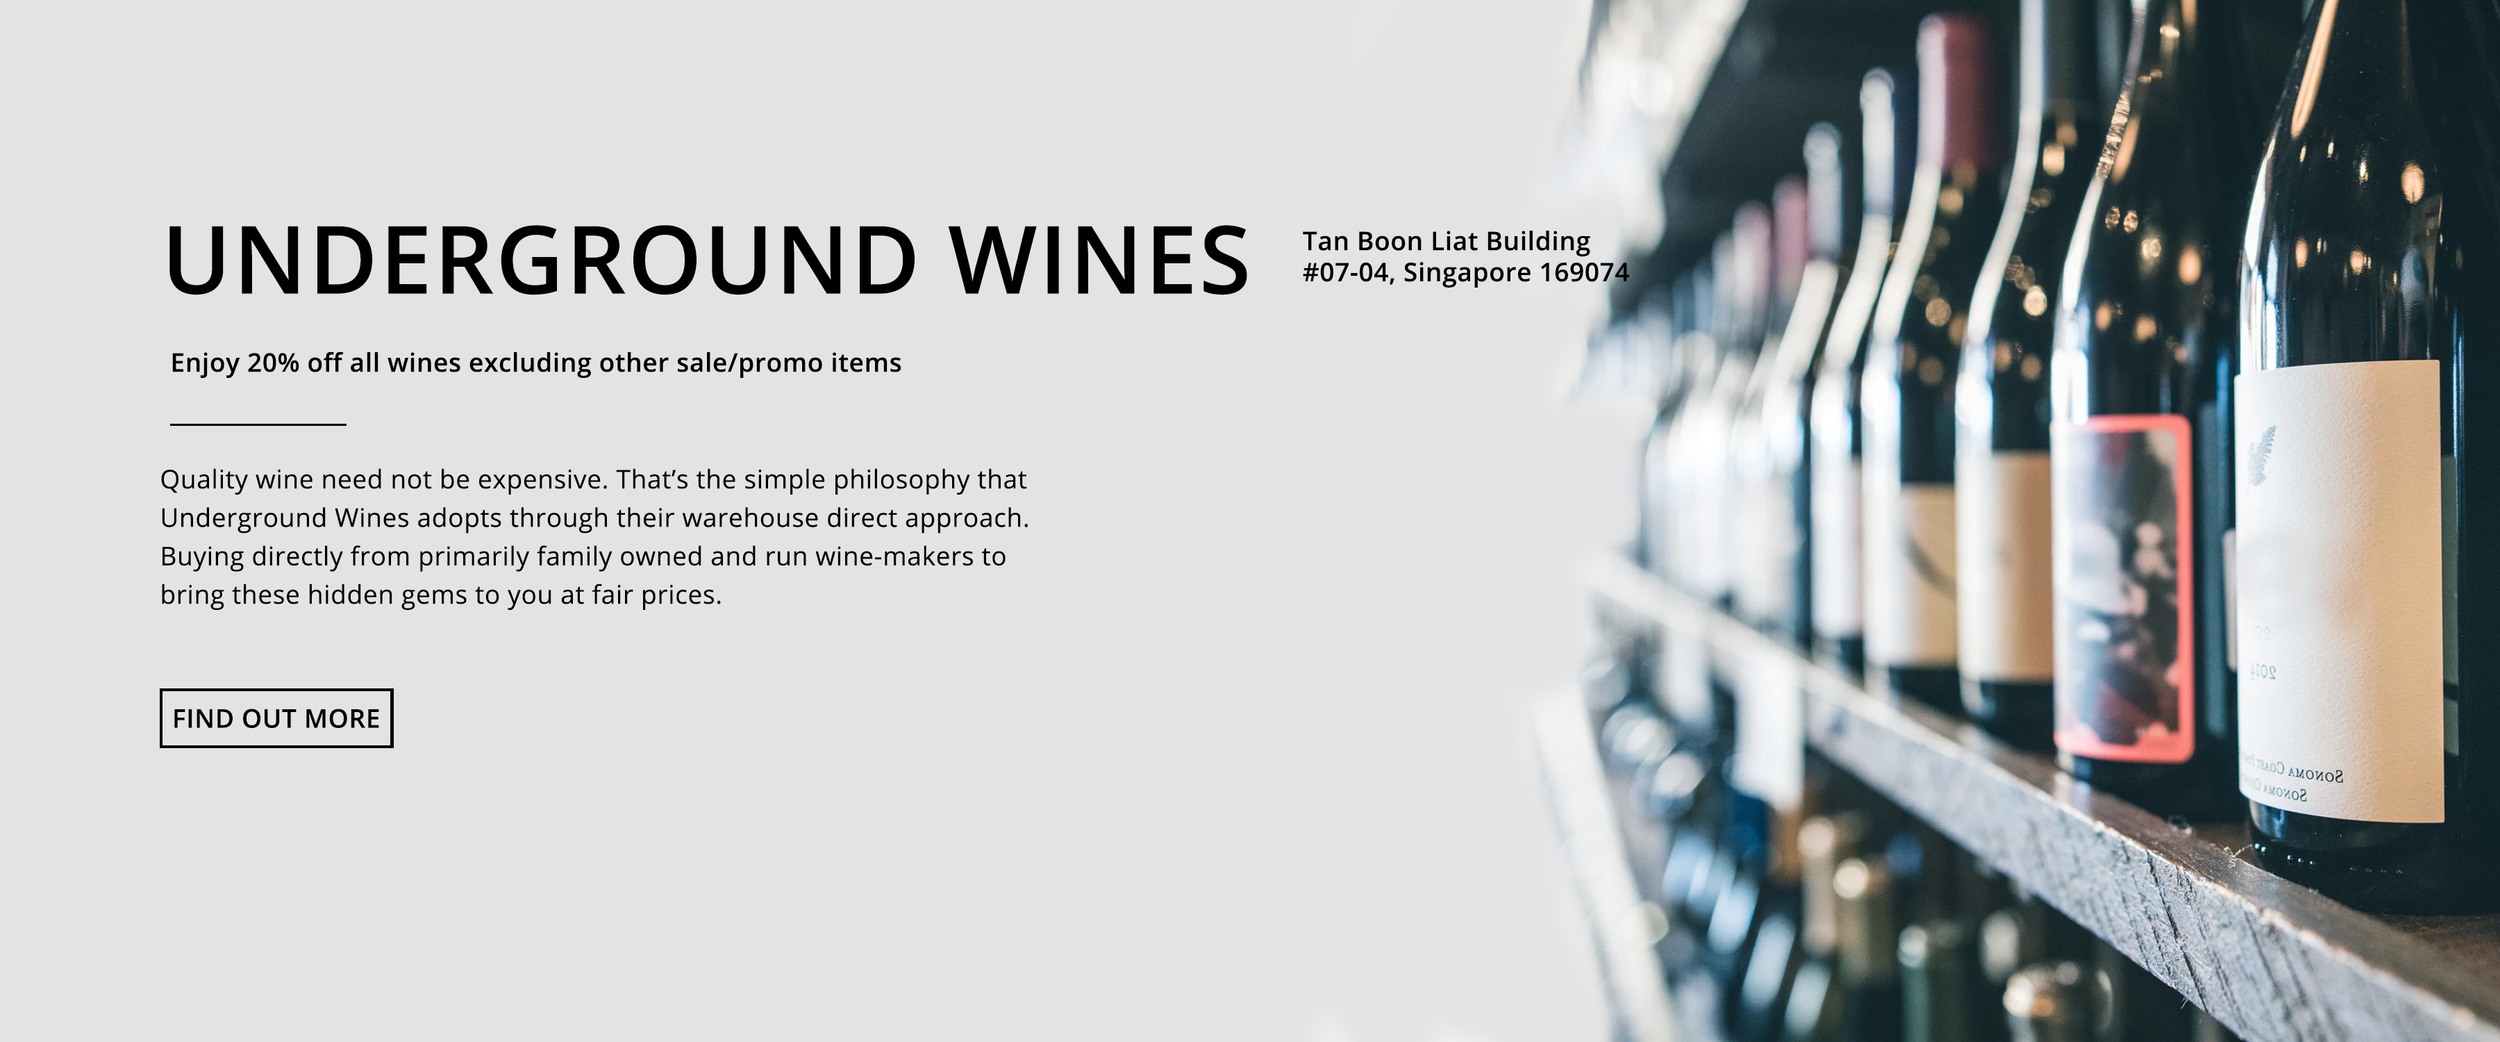 Underground Wines.png